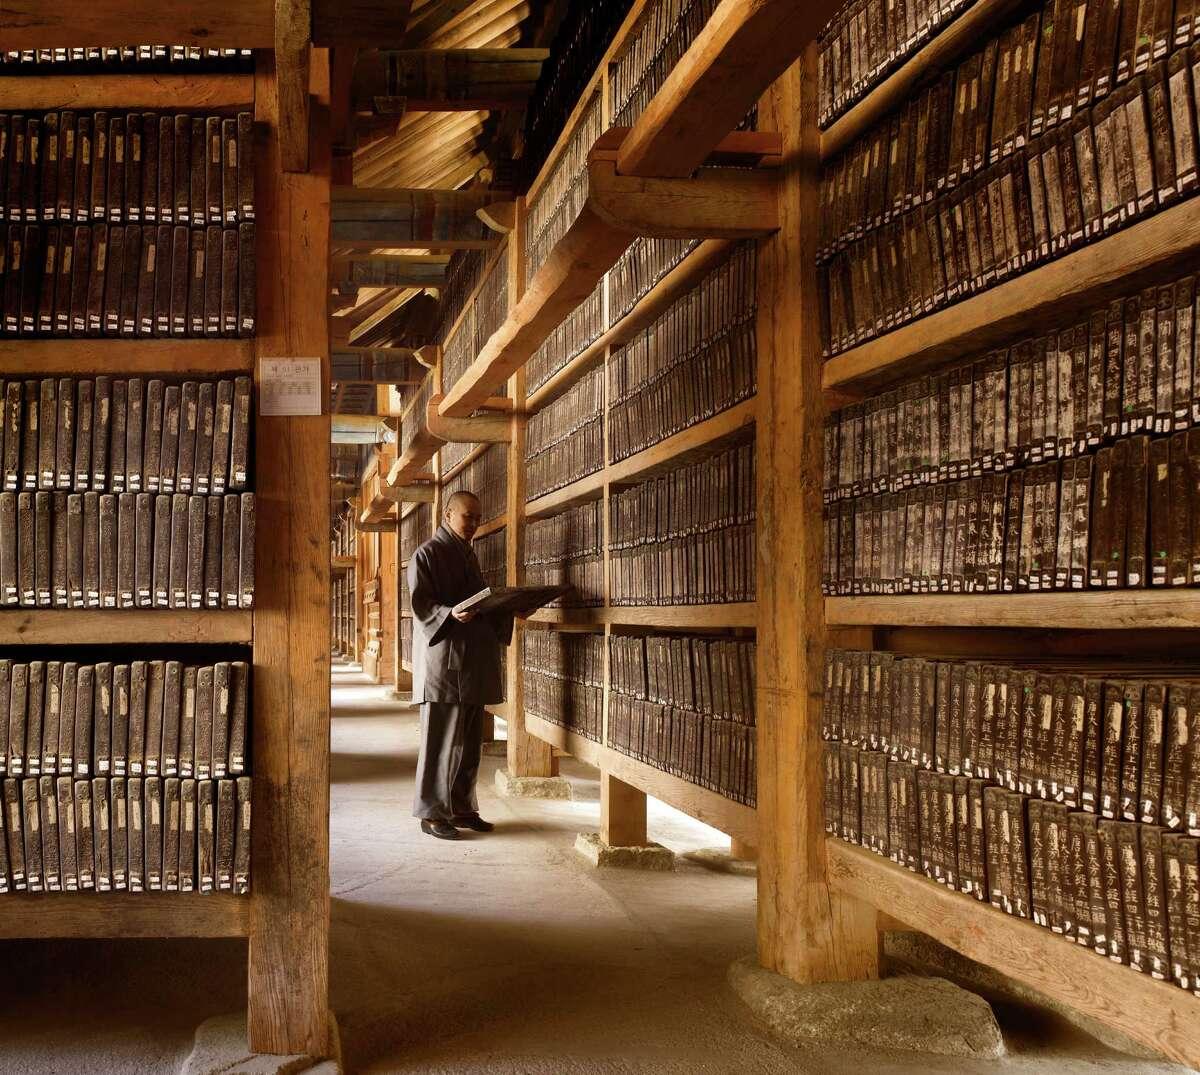 The Tripitaka Koreana, 1251, Haeinsa Temple, South Korea. This view shows the inside of the longer of the two halls that house the Tripitaka Koreana.From